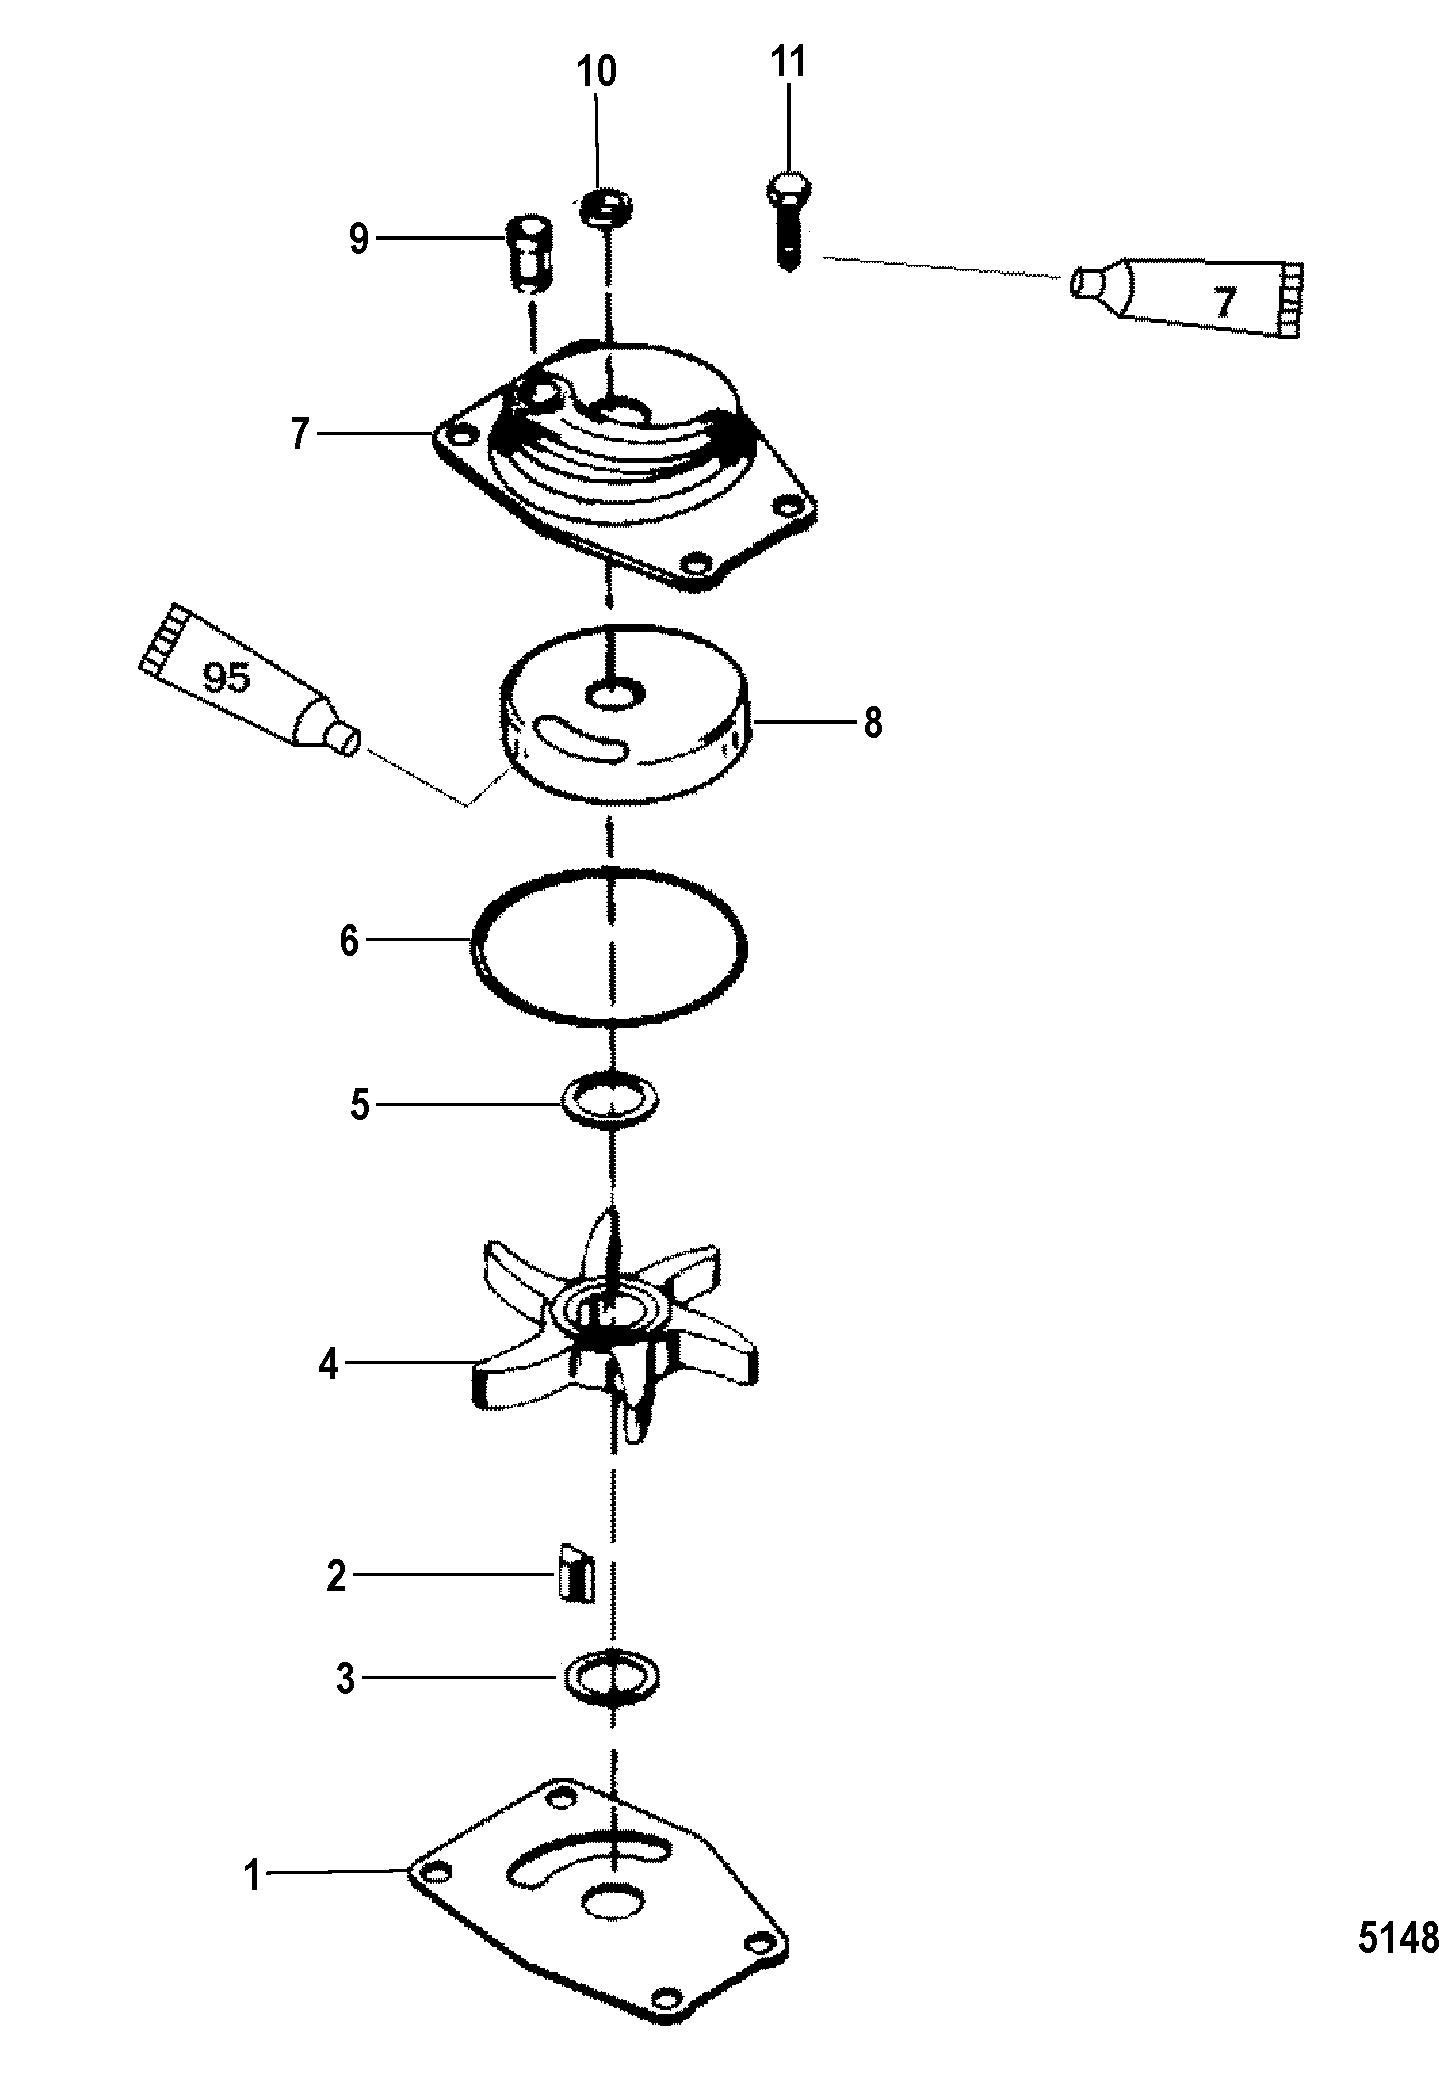 Jet Water Pump Components For Mariner Mercury 20 25 Jet 20 Seapro Marathon 15xd Super 15 Jet